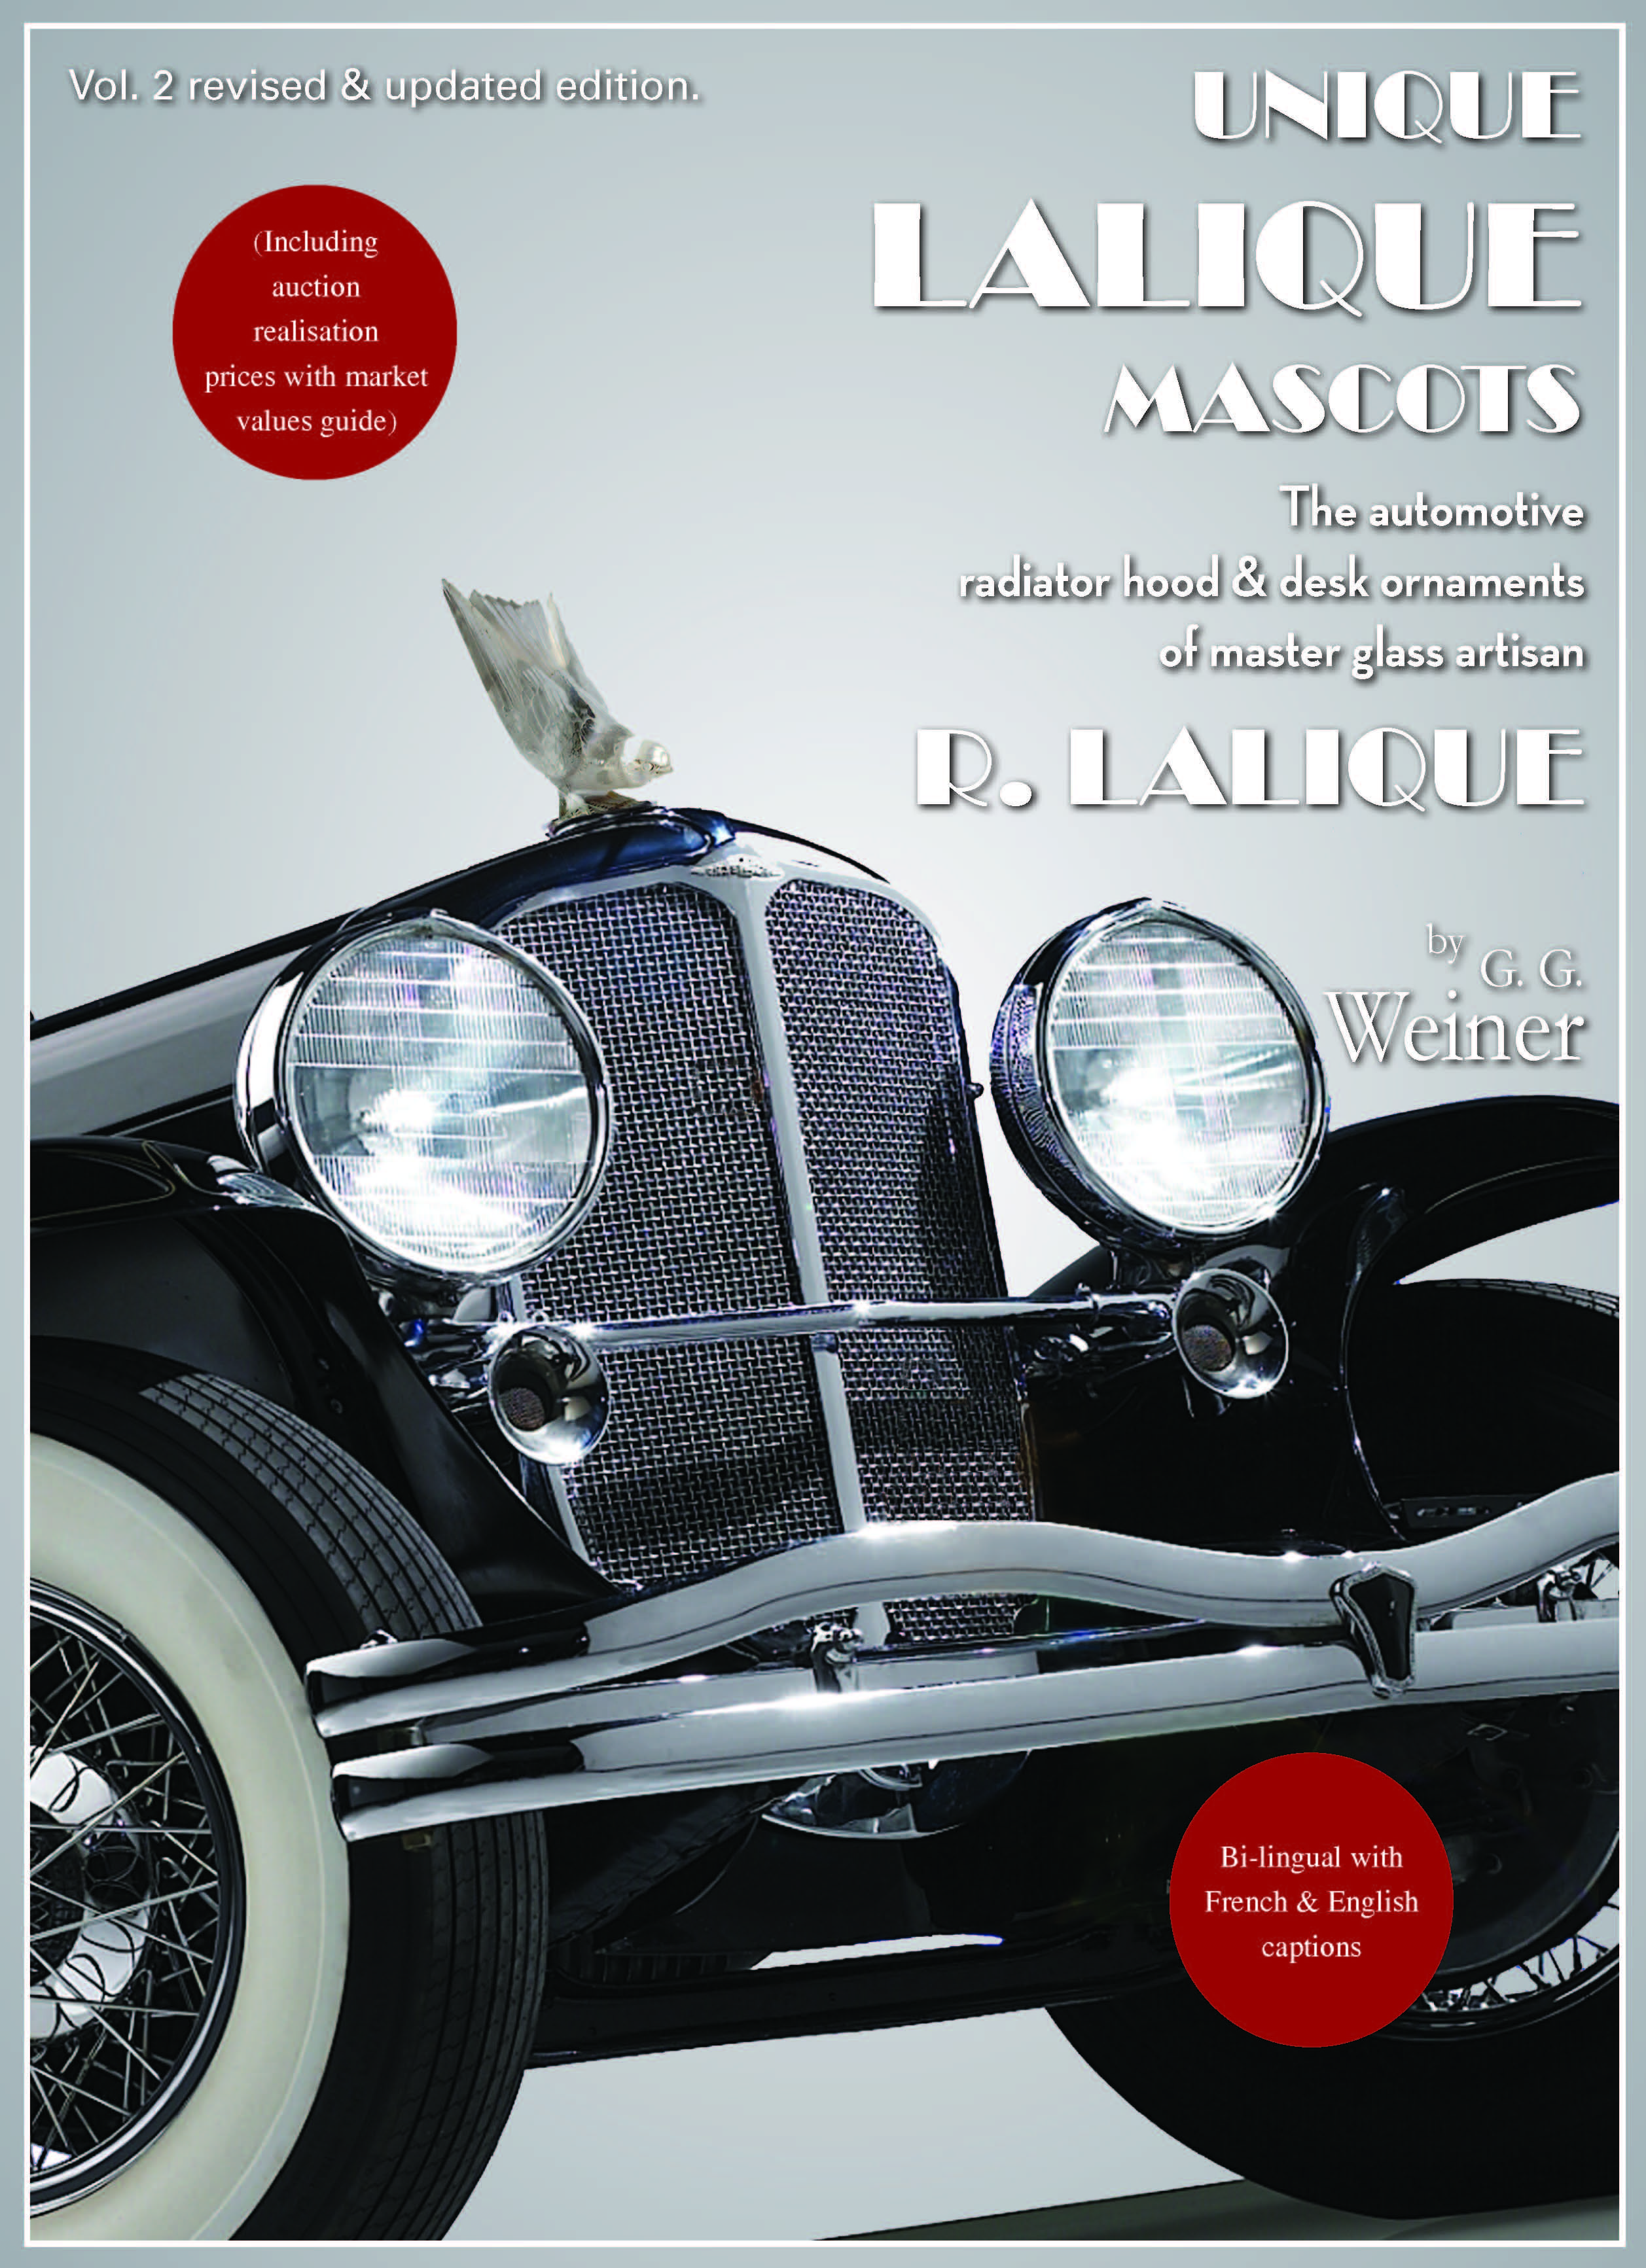 The new Lalique book is here! | René Lalique Car Ornaments ...